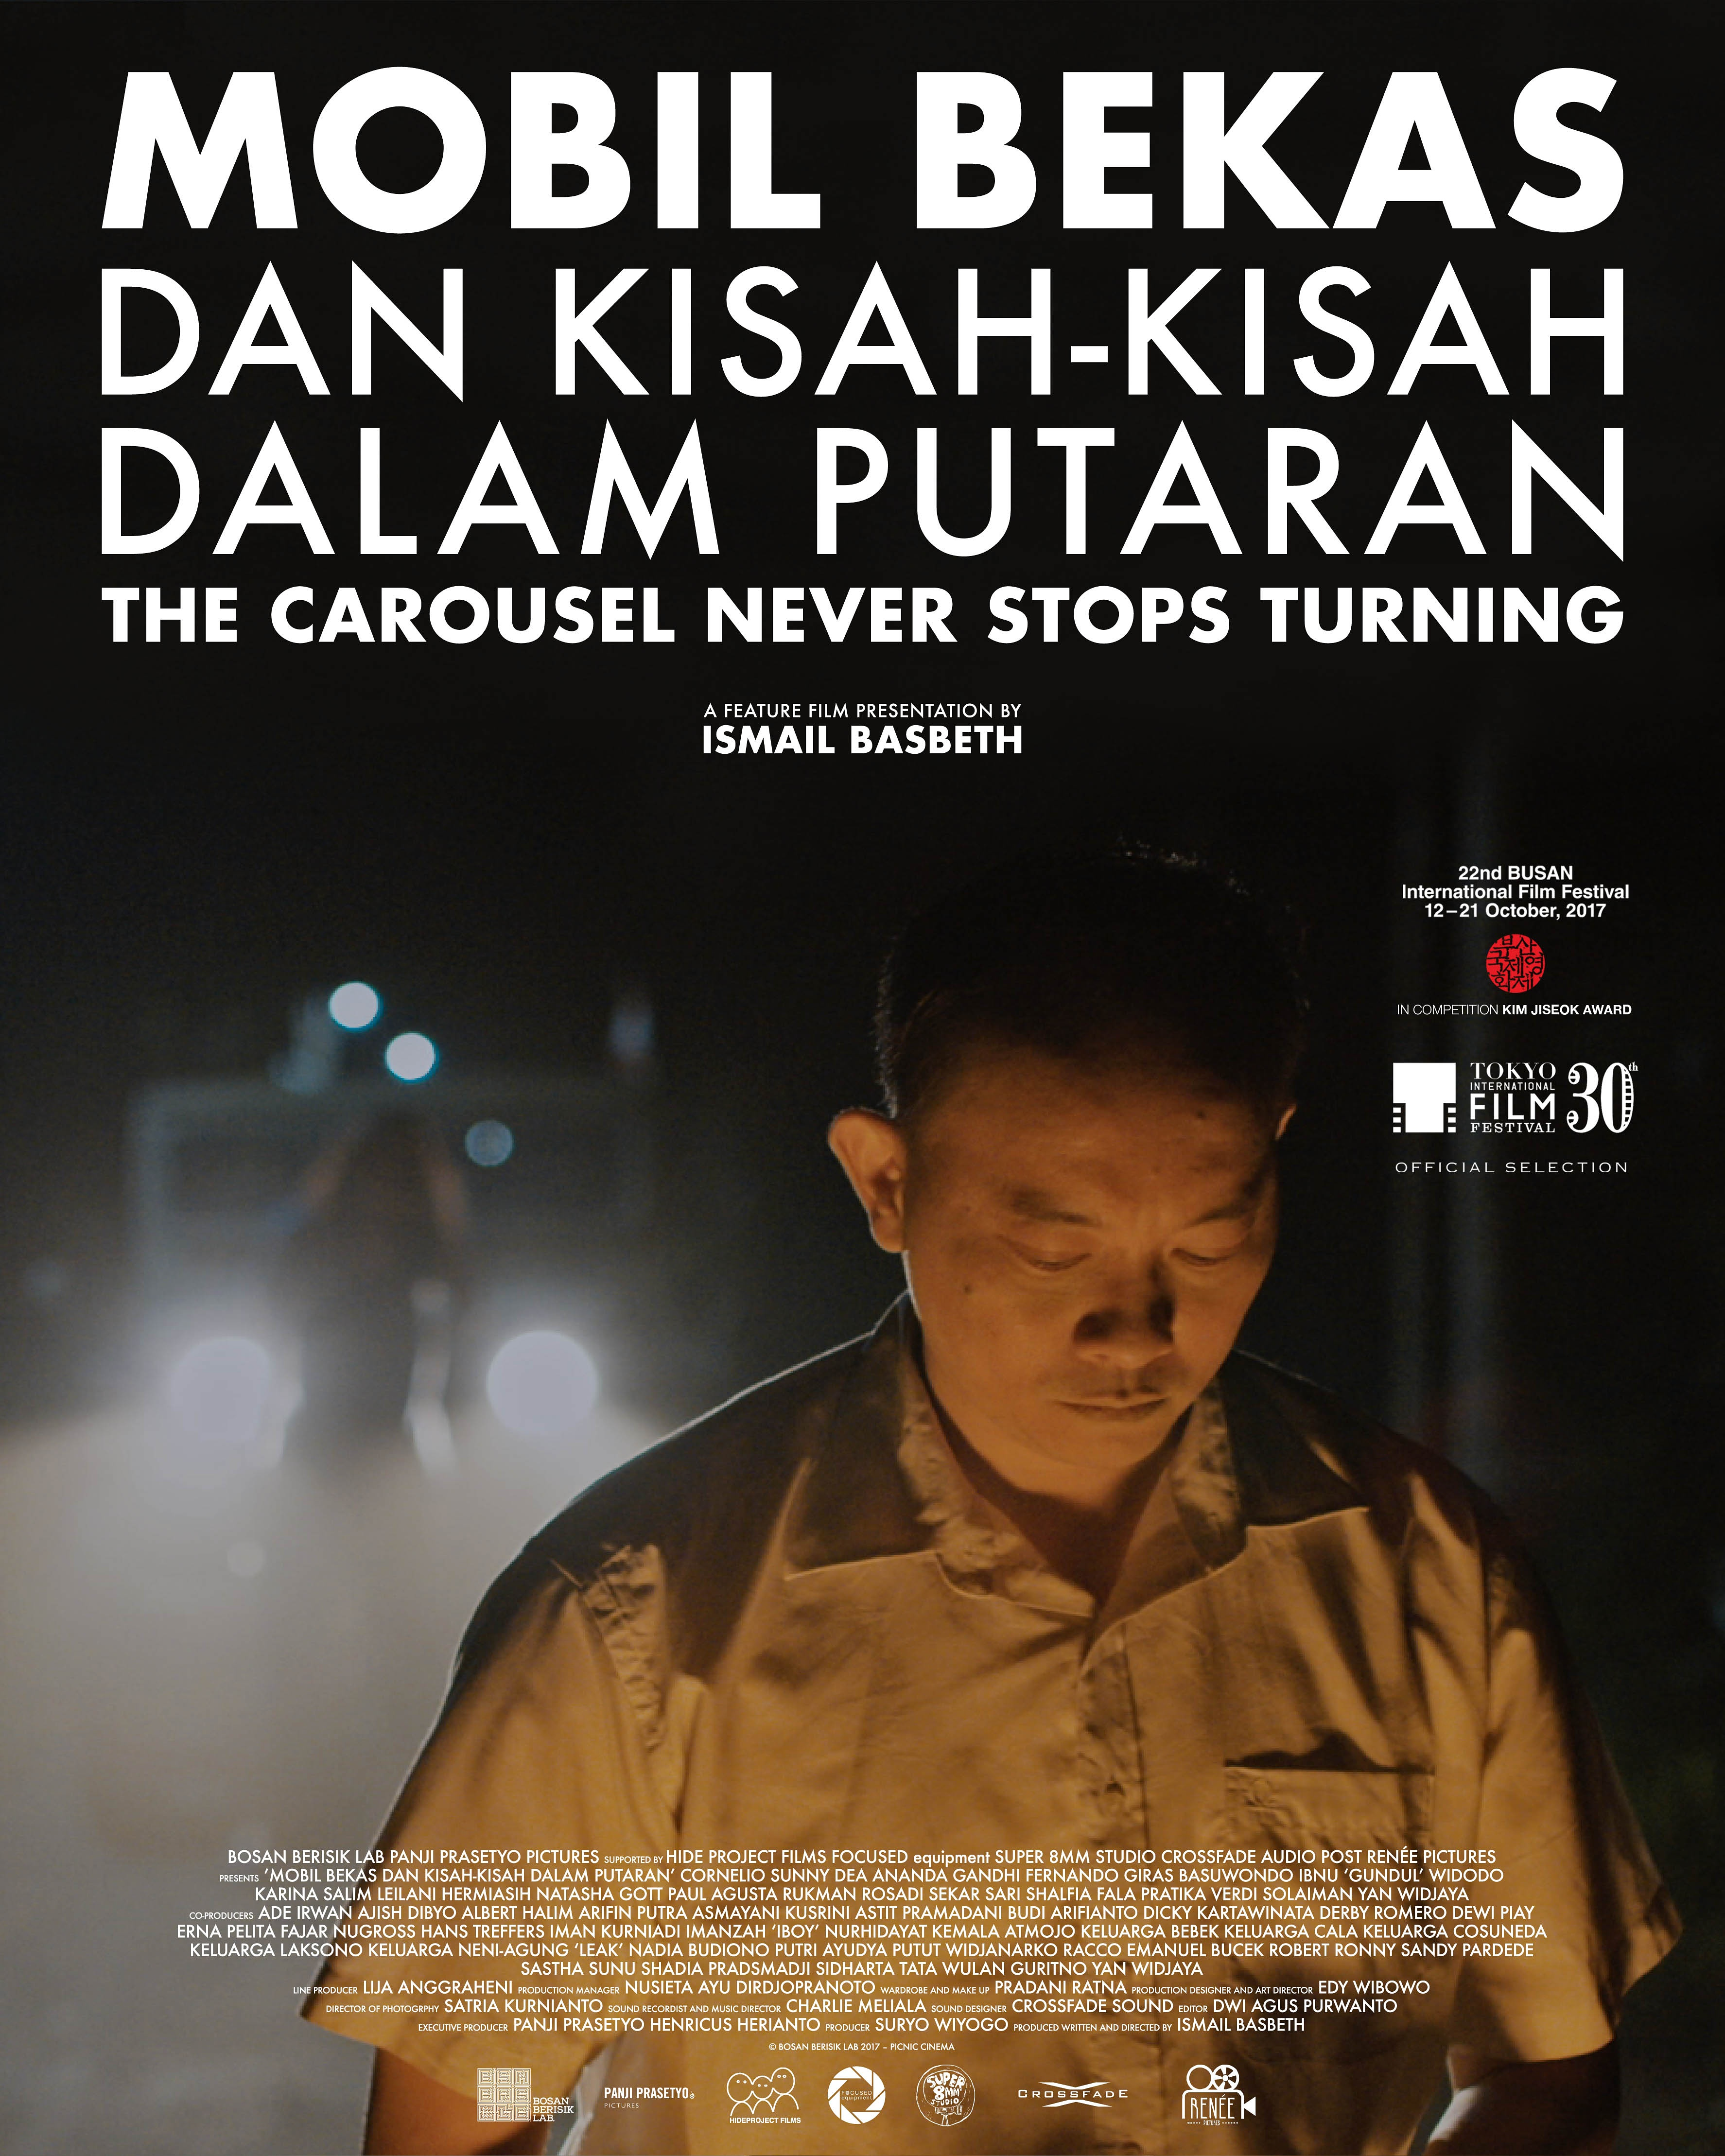 The Carousel Never Stops Turning (2018) - IMDb